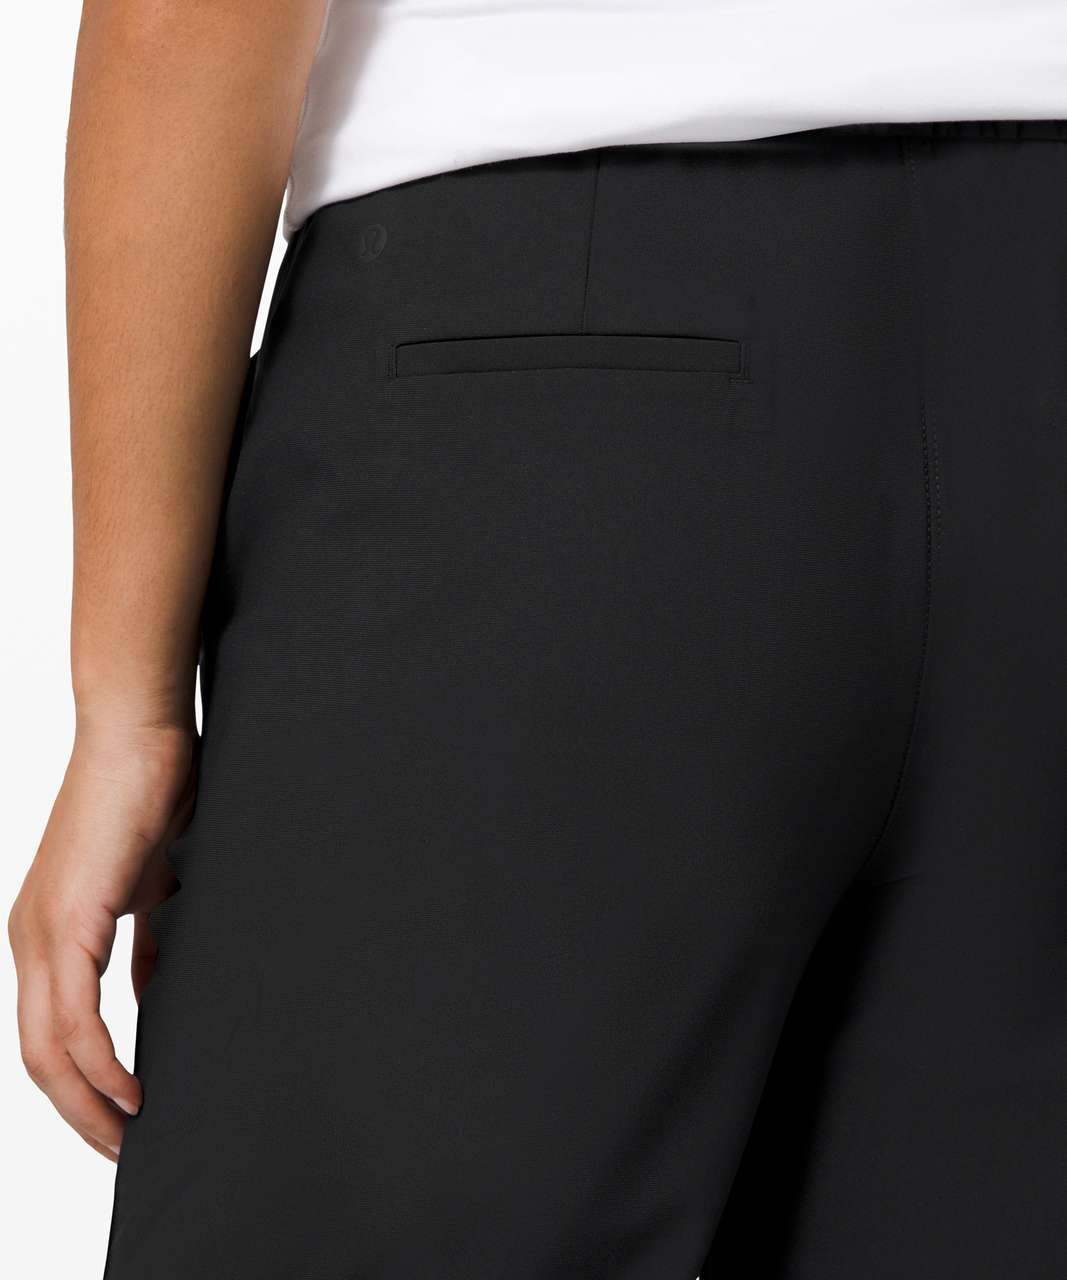 Lululemon Your True Trouser 7/8 Pant - Black